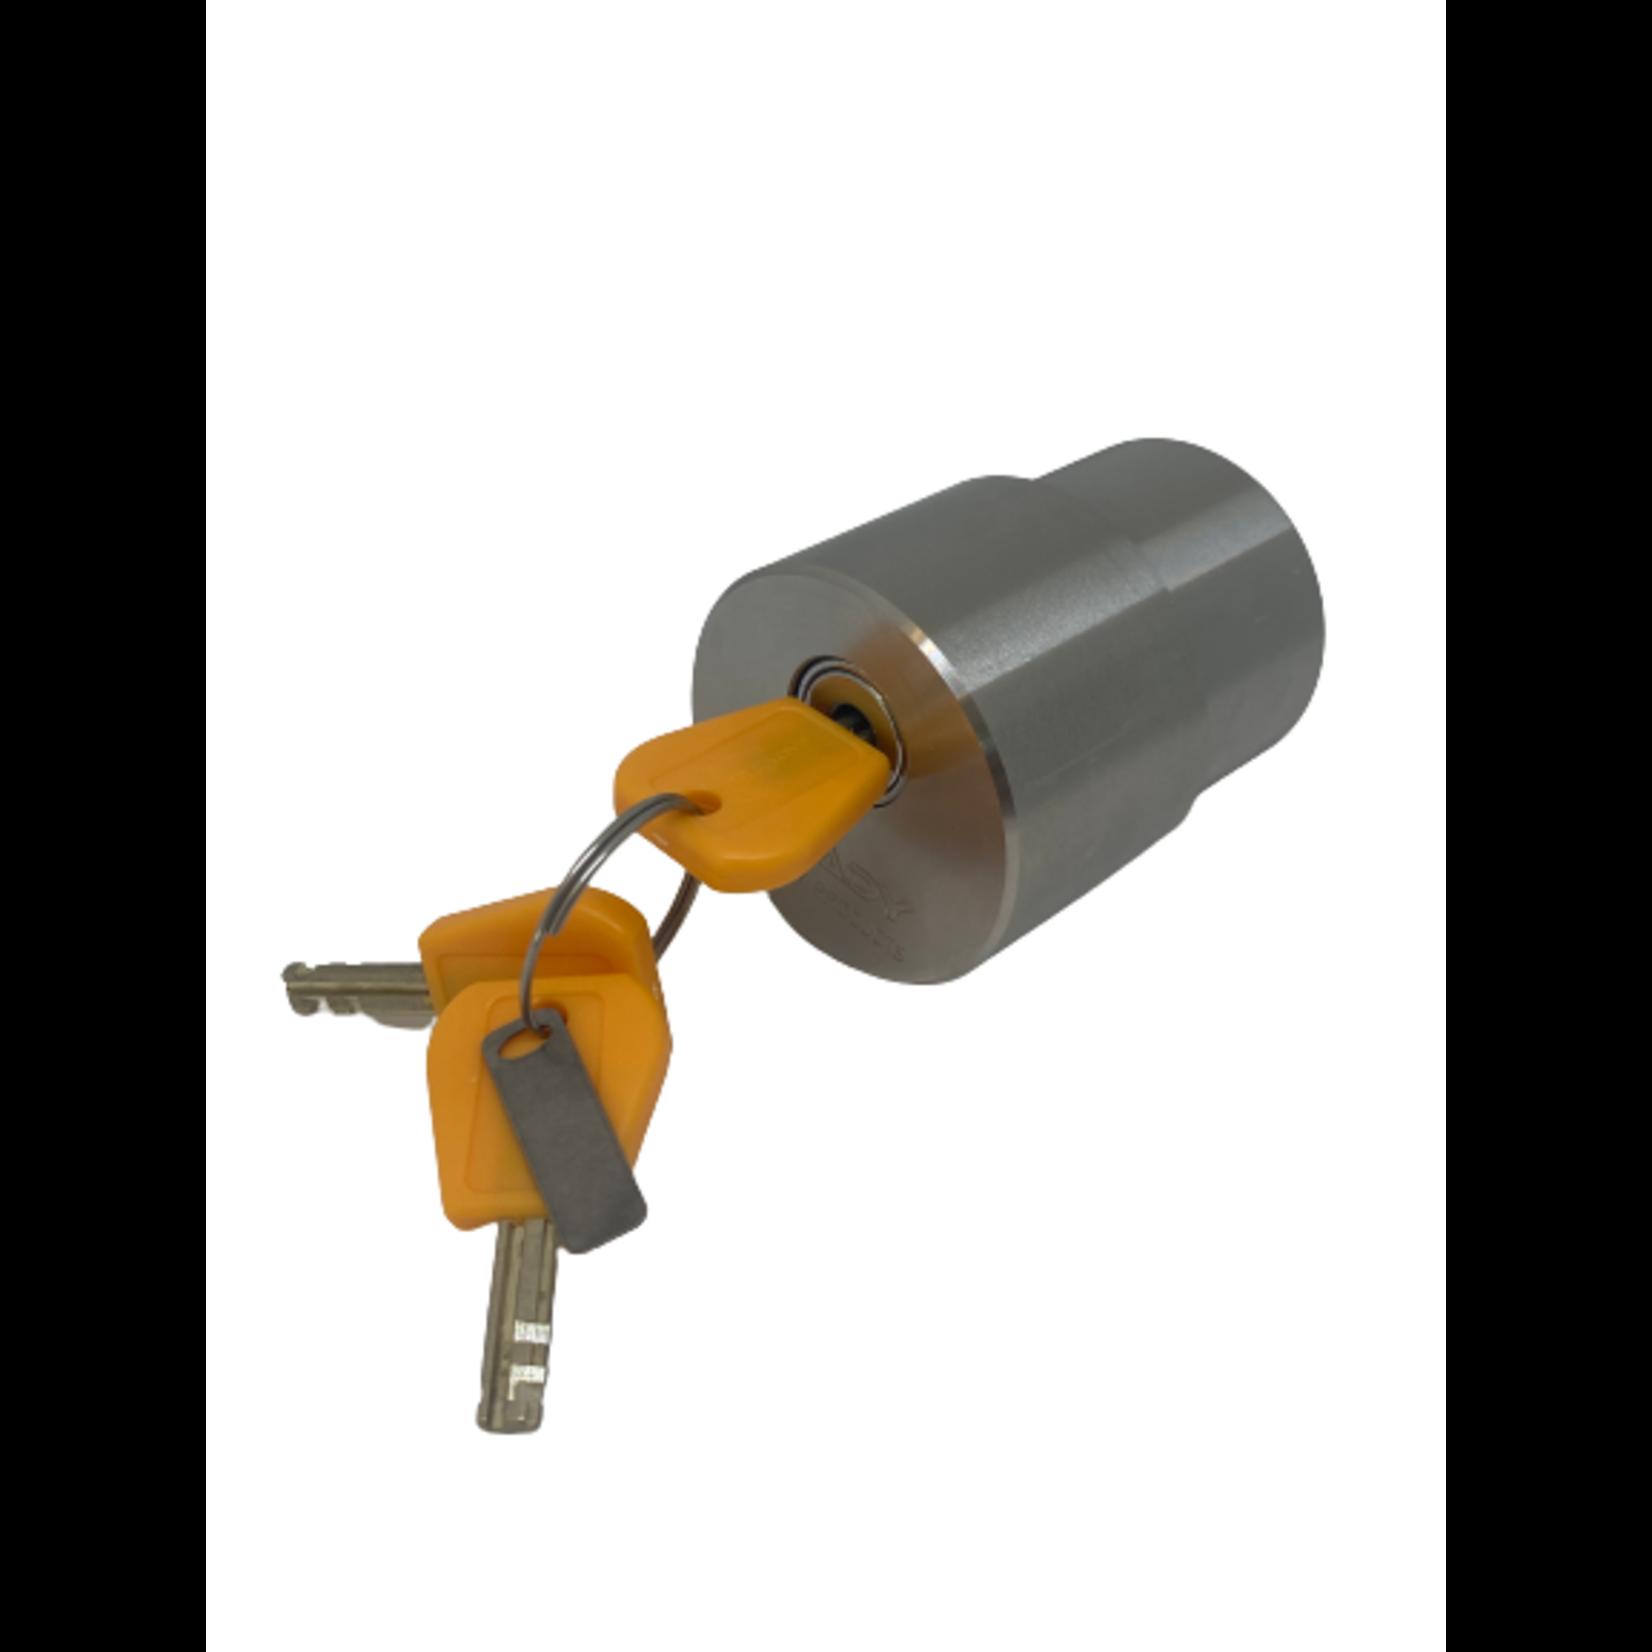 Steady Steady BBM3 - bolt lock - SCM approved